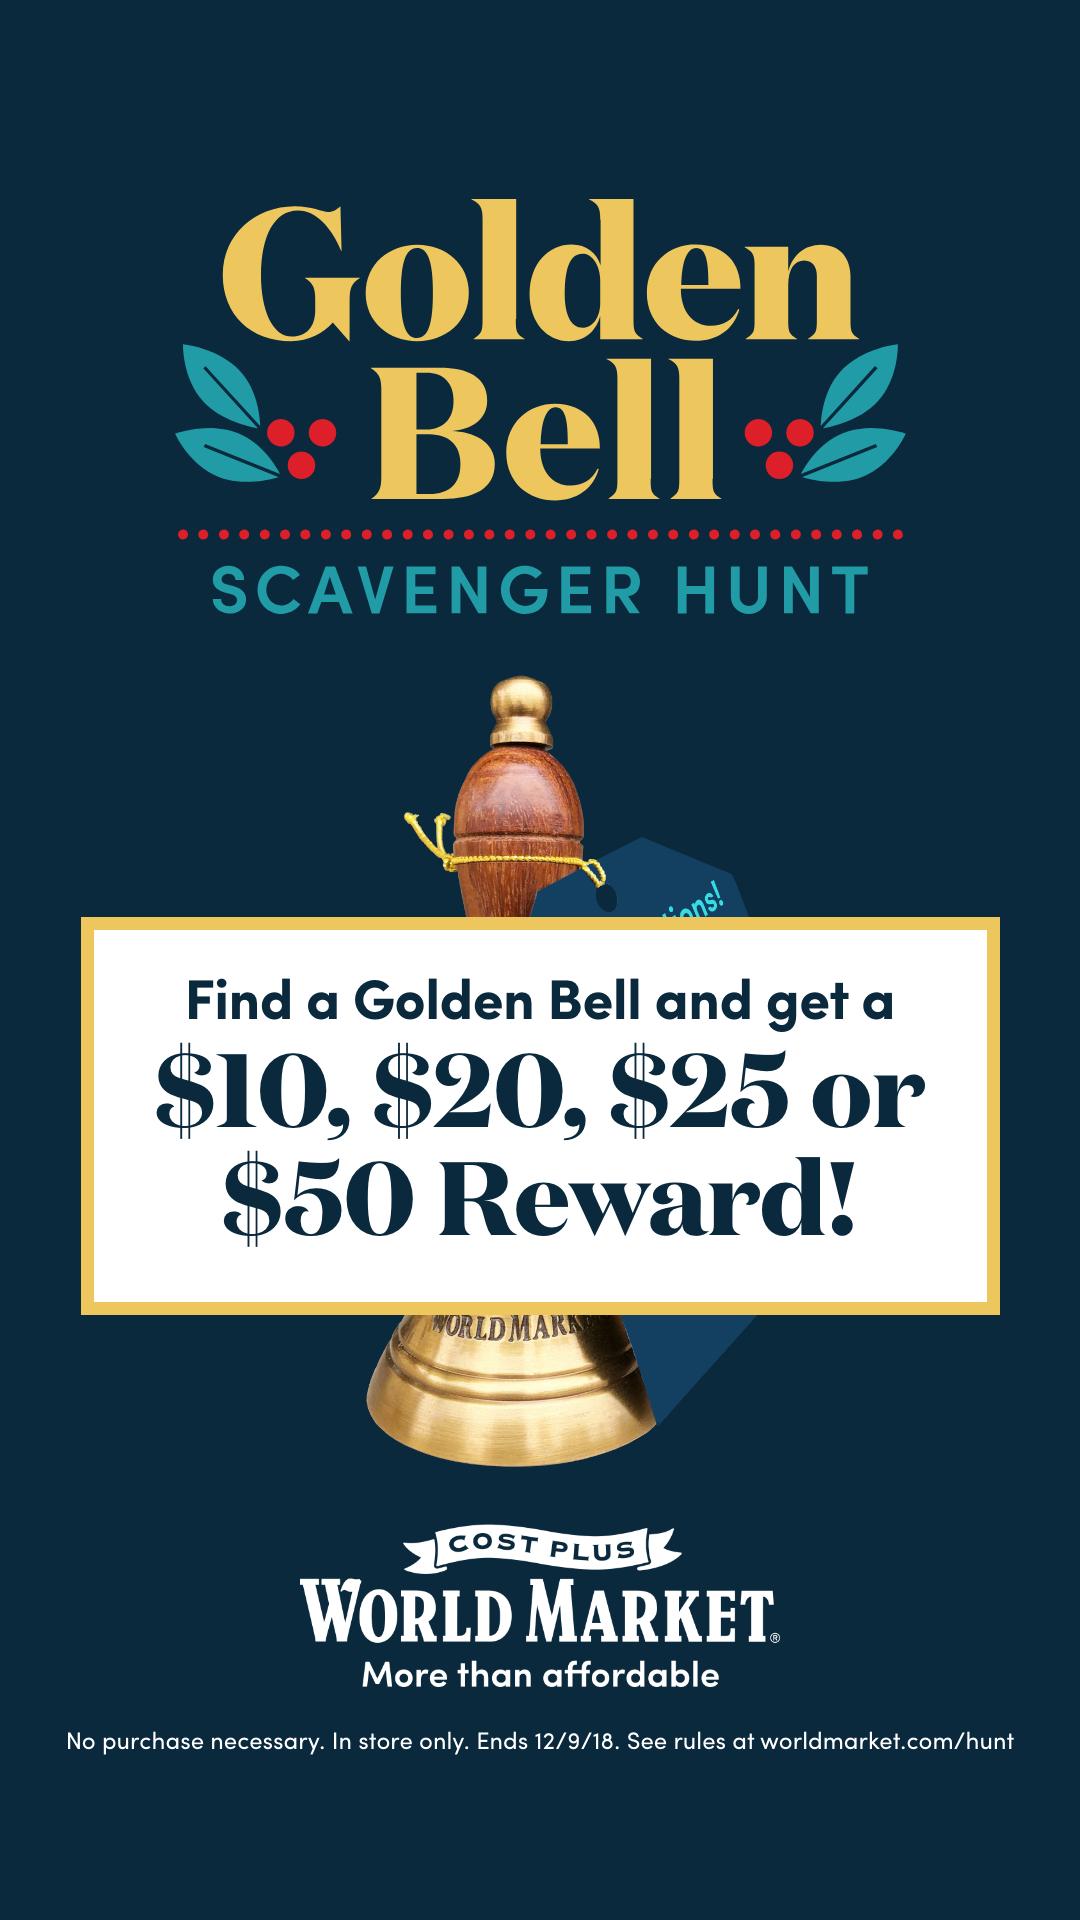 Golden Bell at World Market Holiday 2018